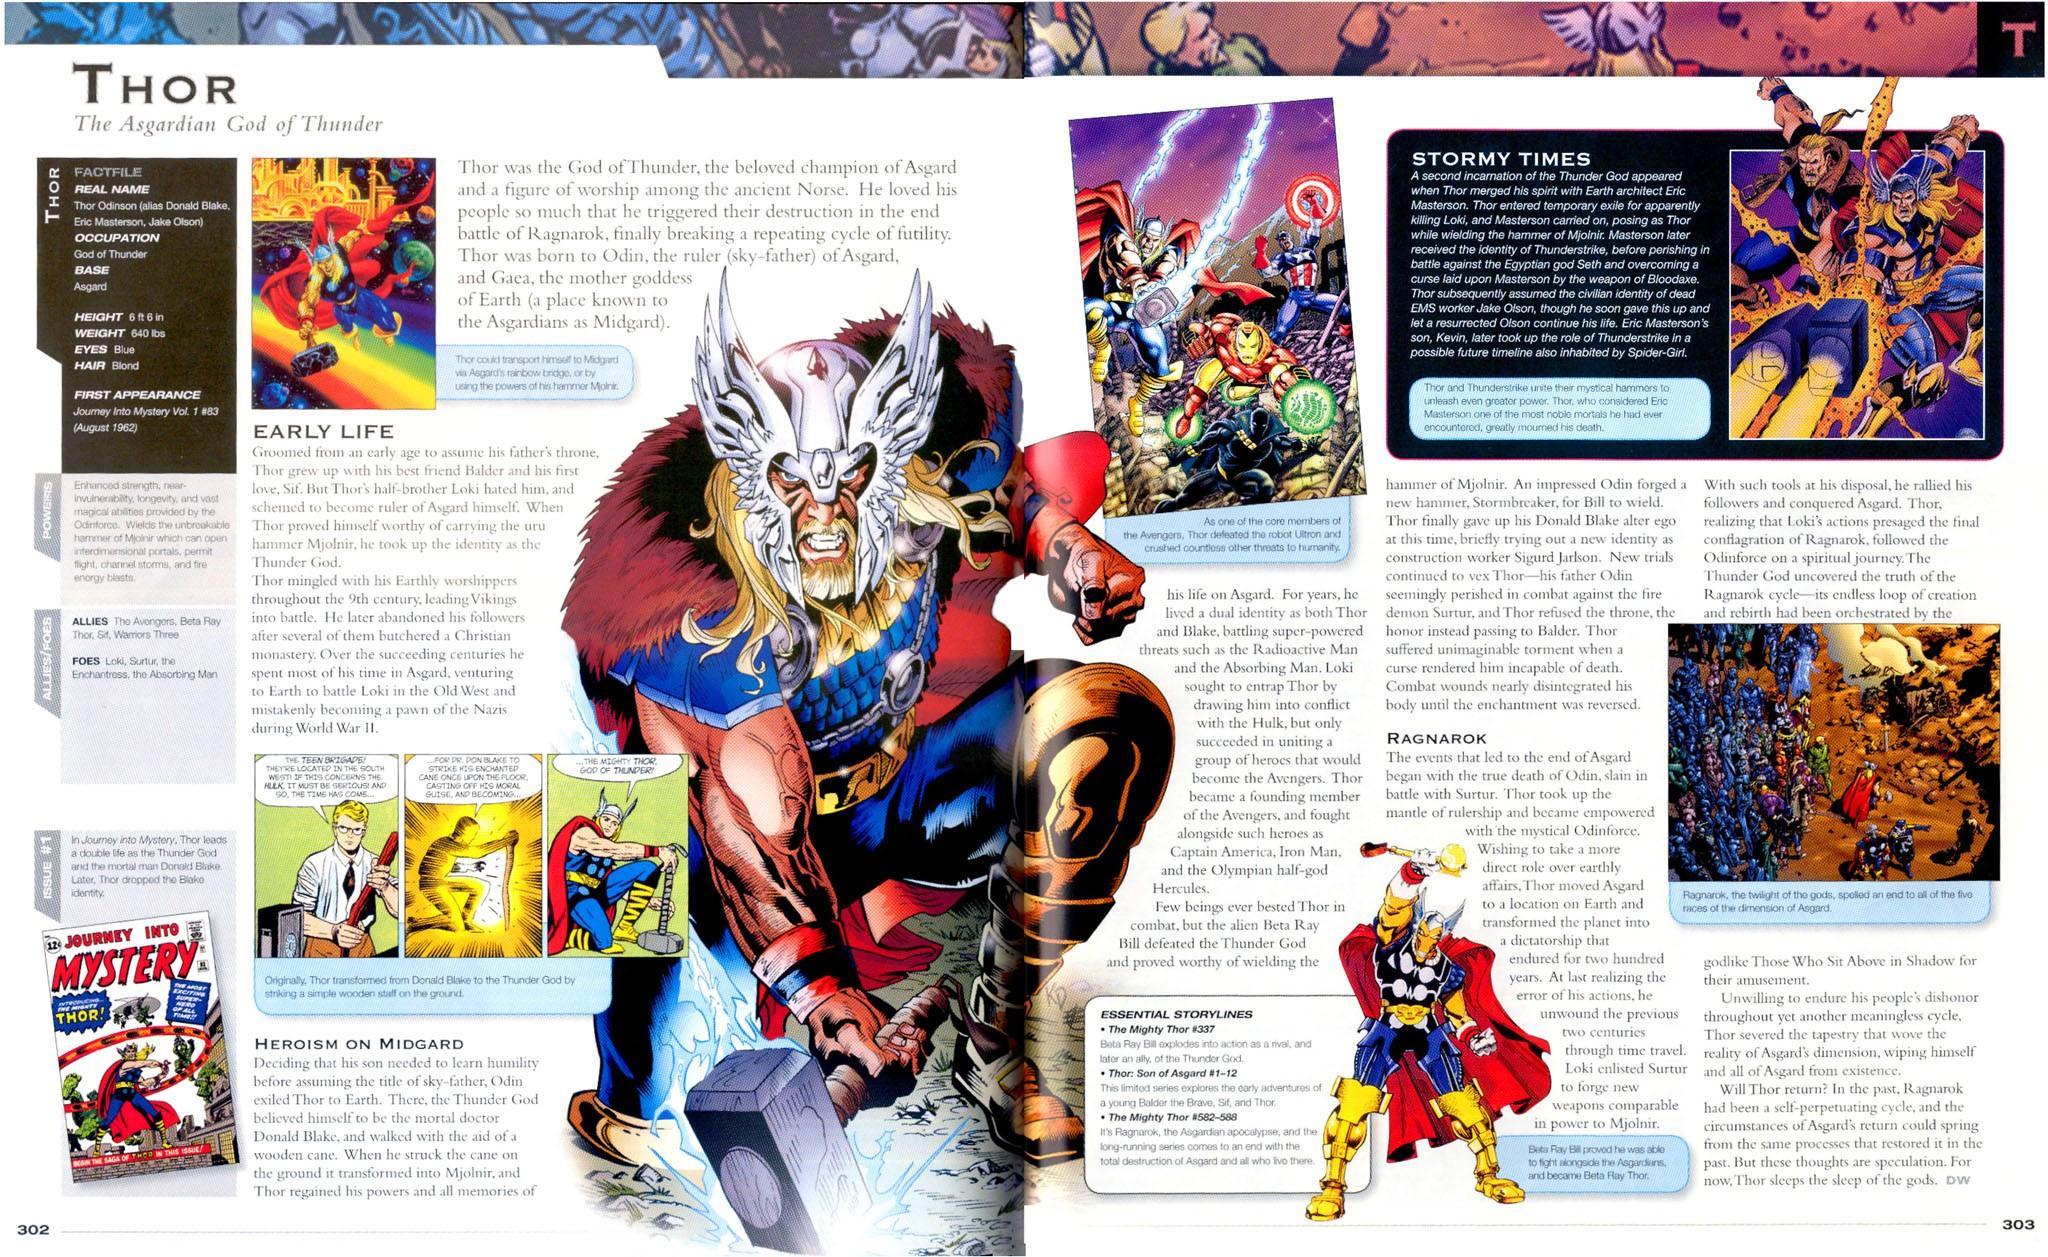 Marvel superhero book